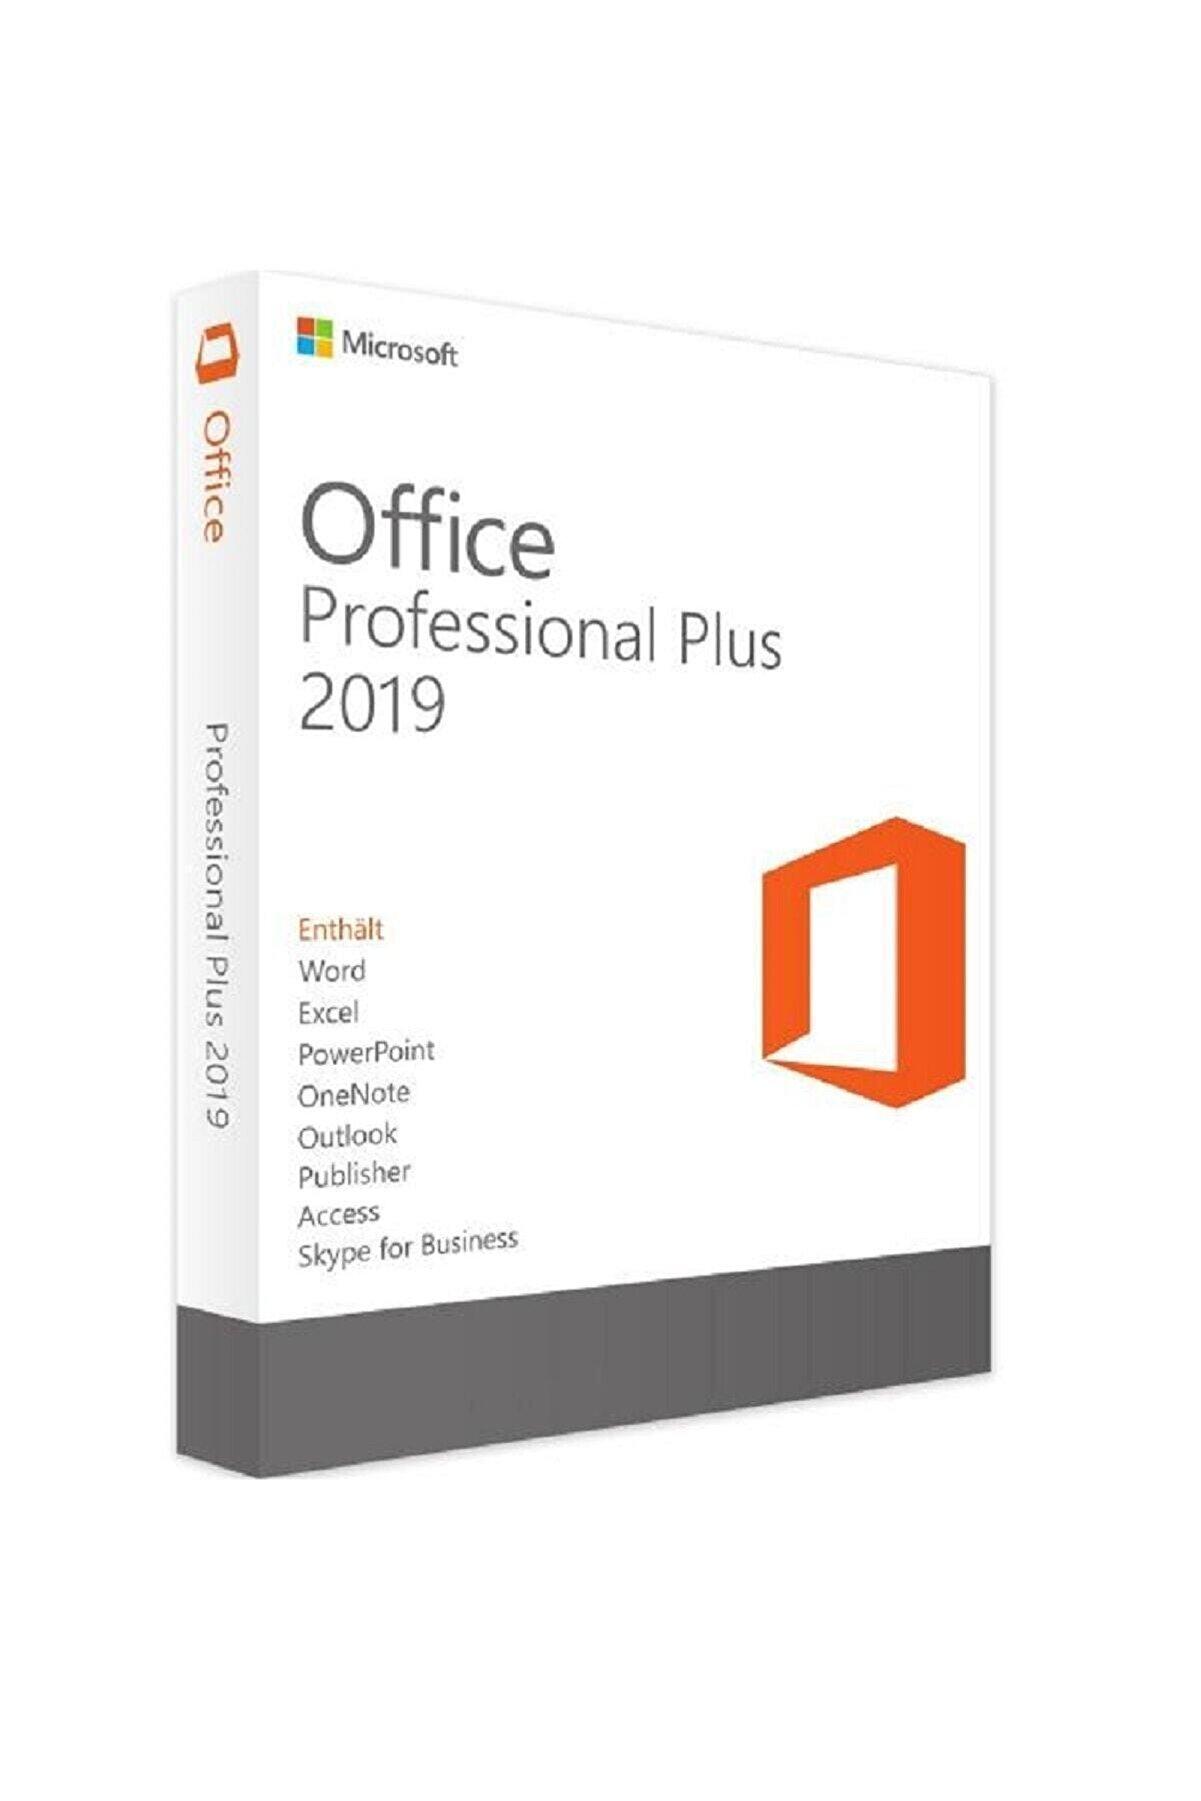 Microsoft Office 2019 Pro Plus Lisans Anahtarı Key + 32&64 Bit Uyumlu